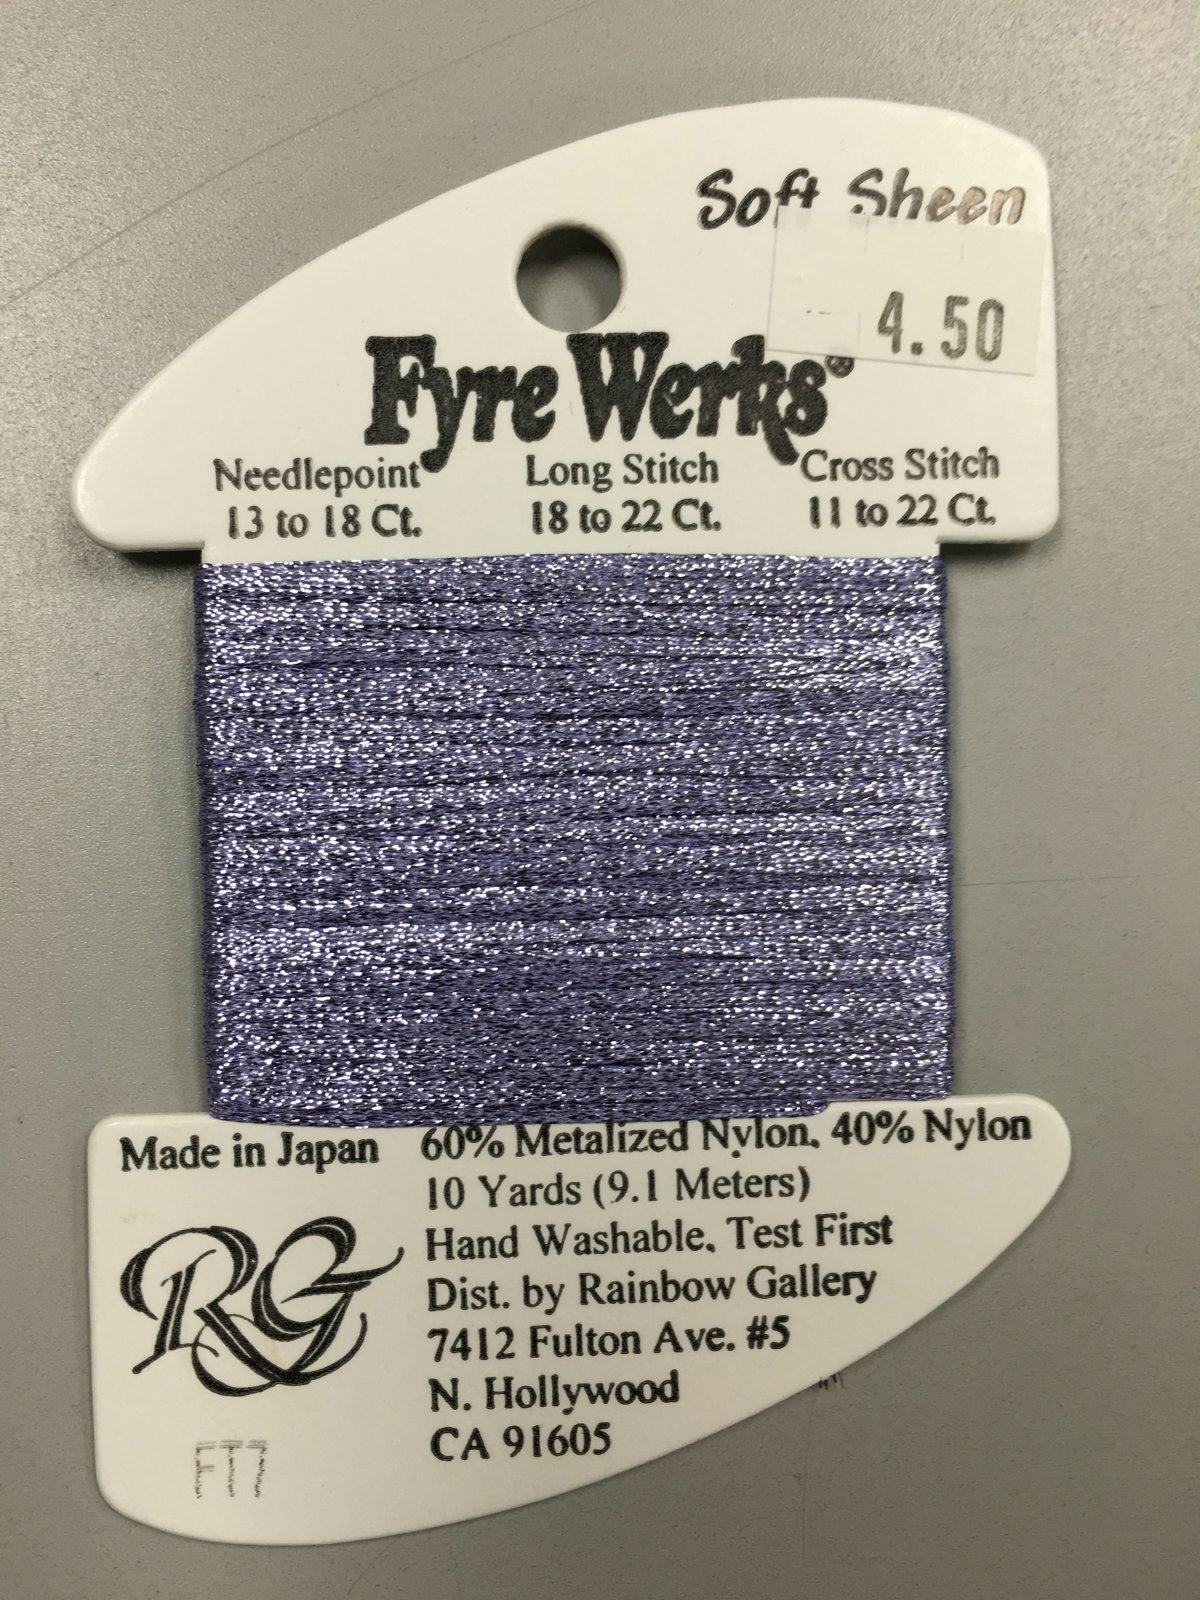 Fyre Werks Soft Sheen FT7